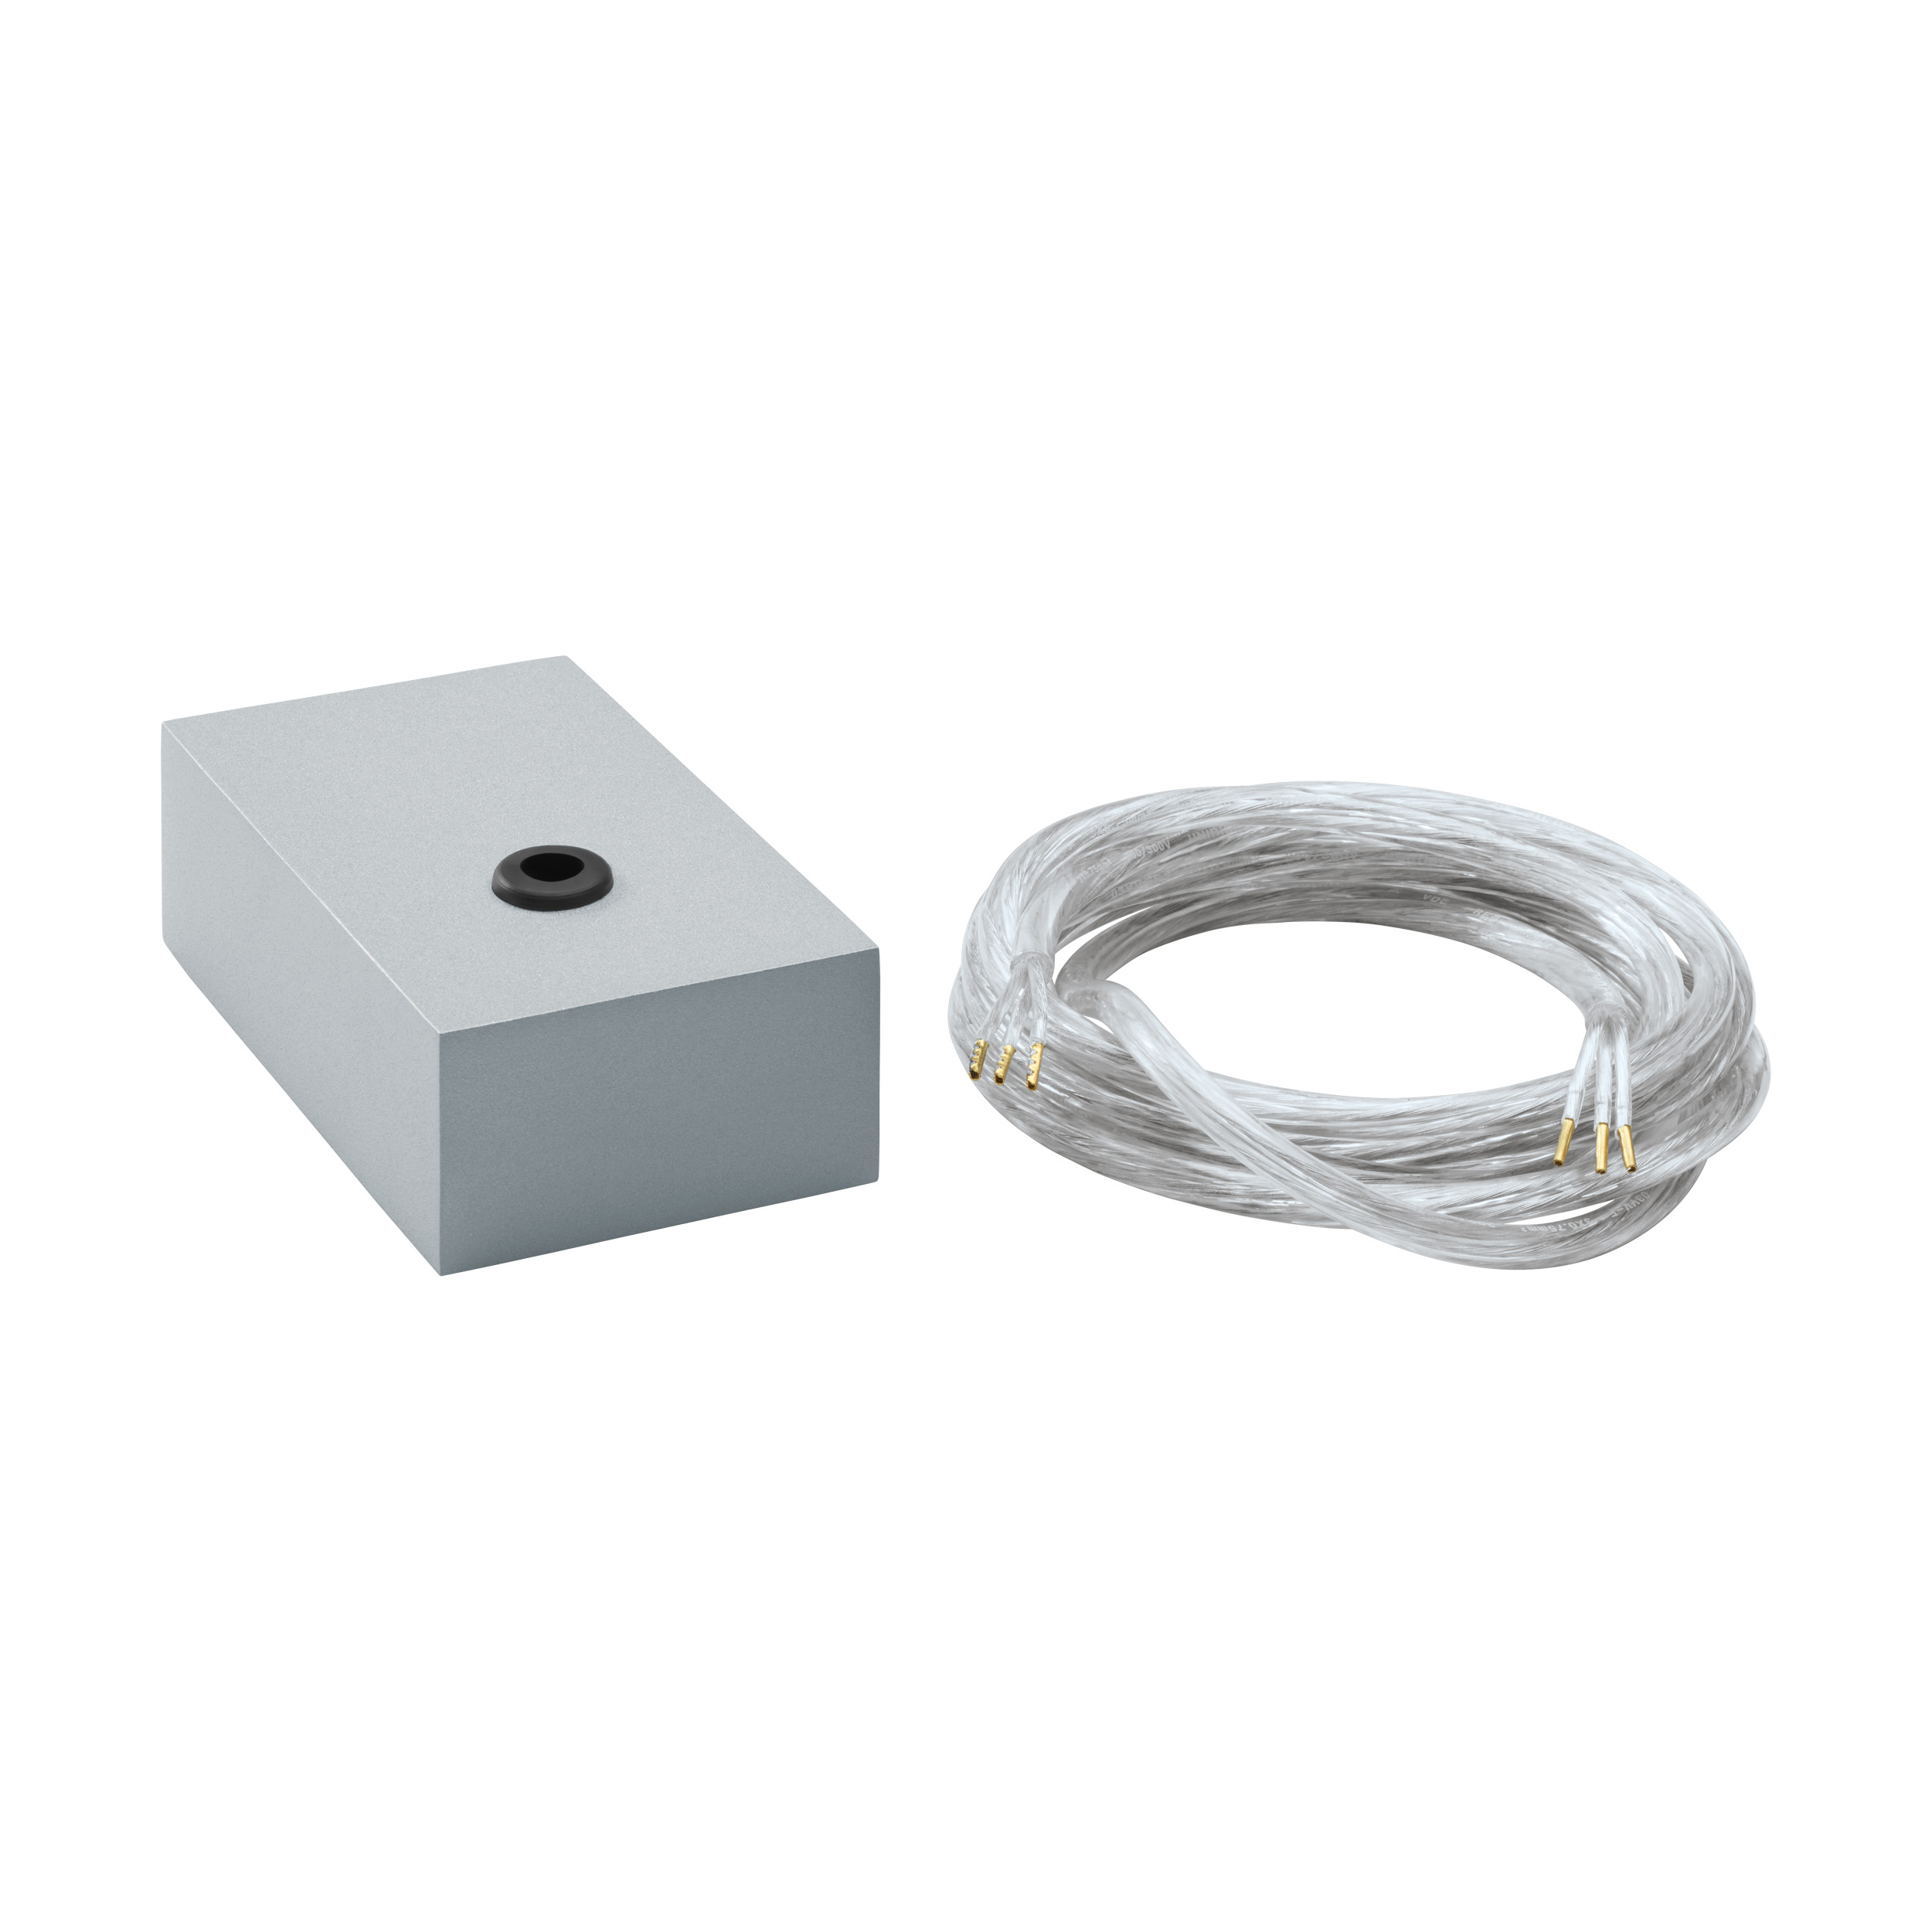 1 Stk Einspeisung 5 polig Aluminium eloxiert IP20 LI65122---